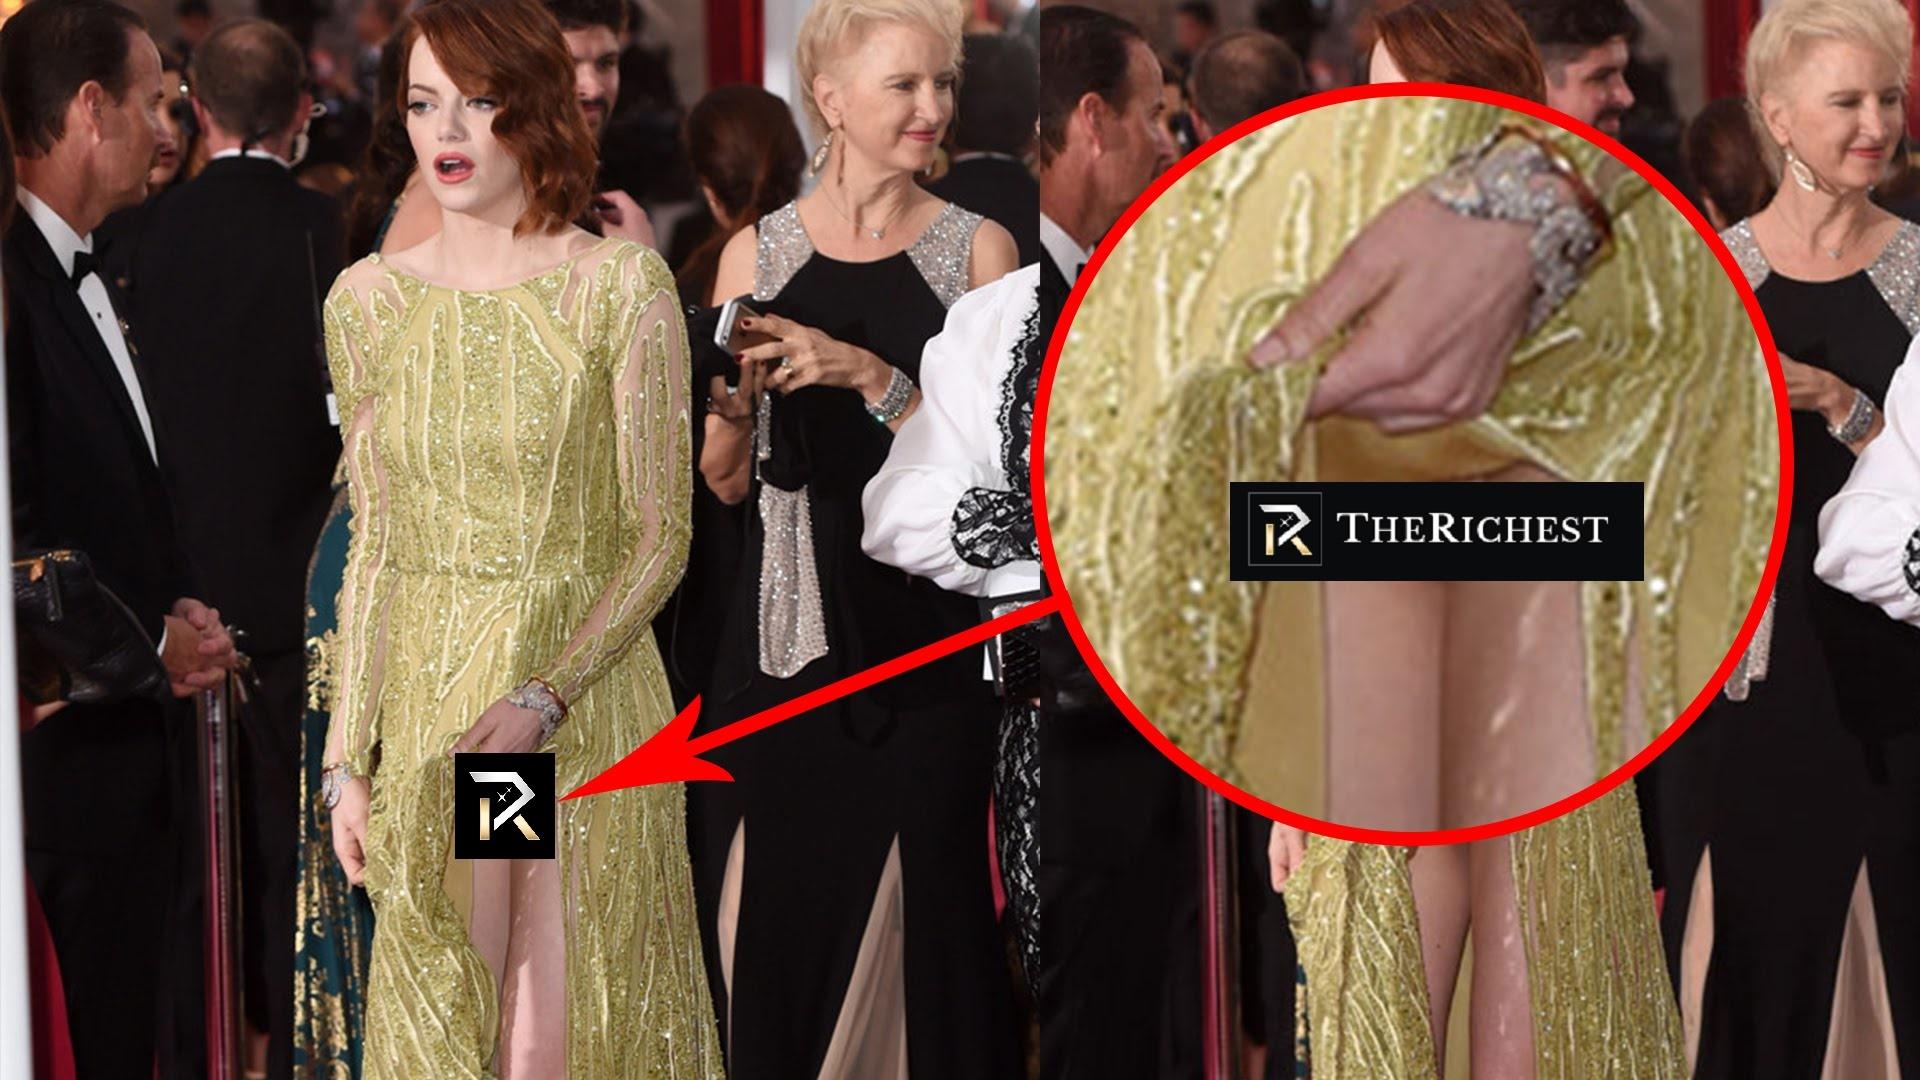 26 Shocking Celebrity Wardrobe Malfunctions You Forgot About